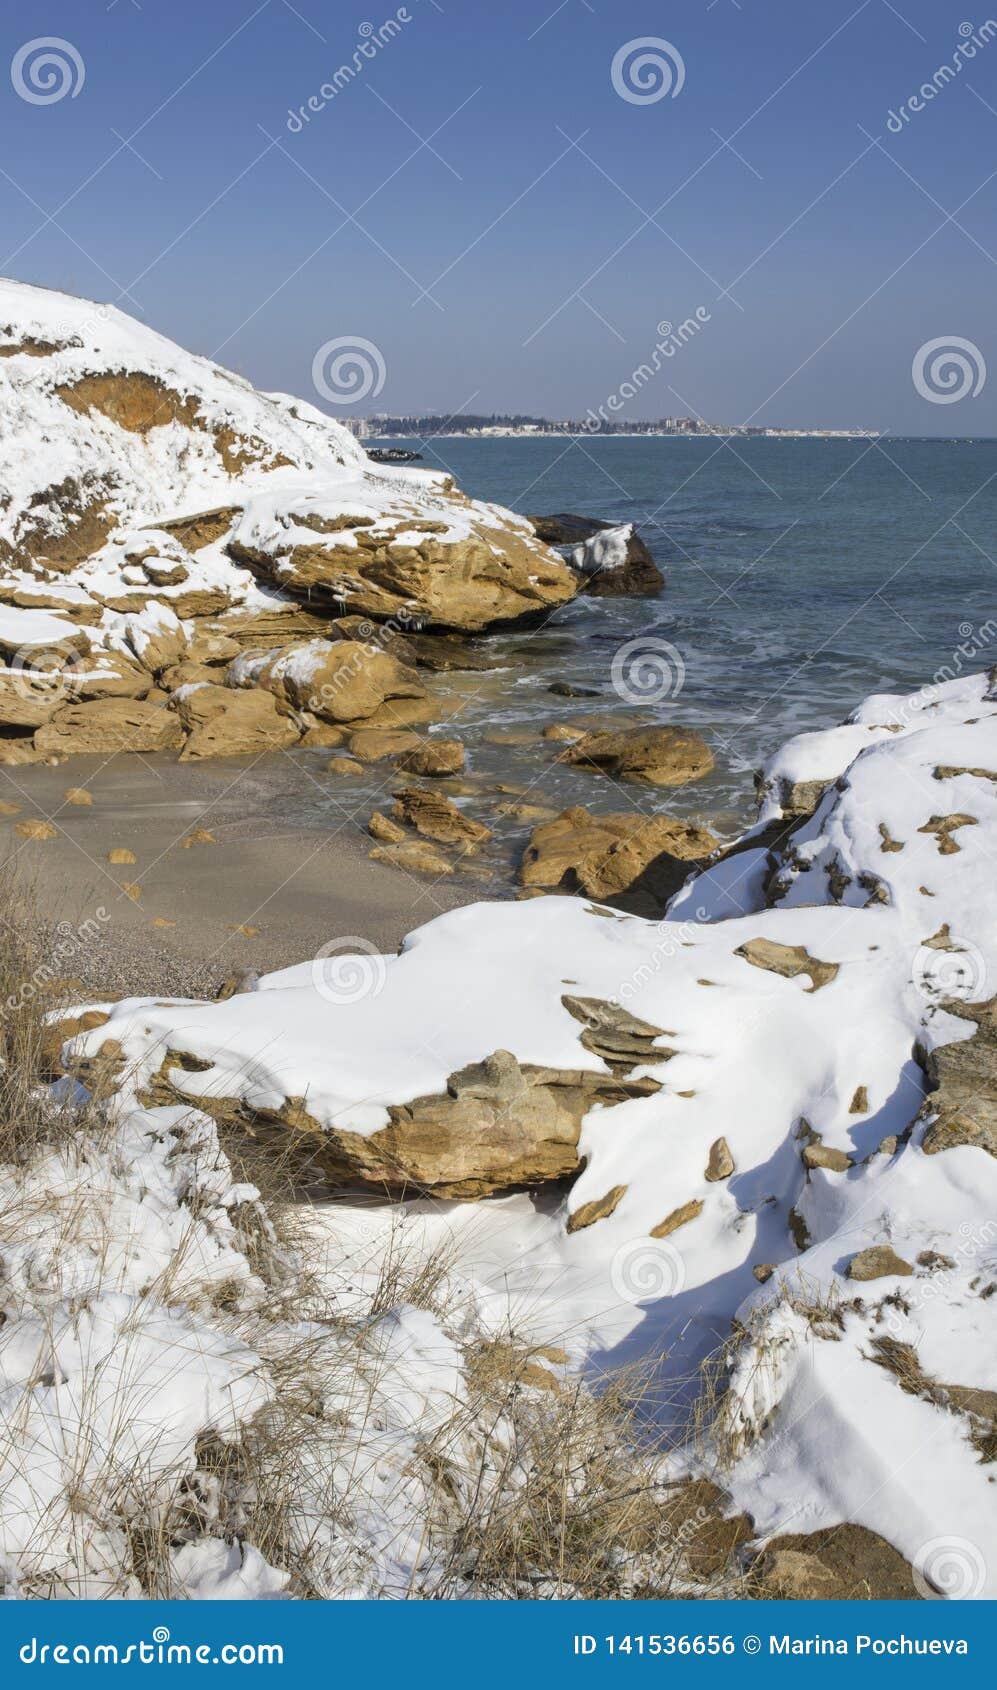 Nieve en el mar